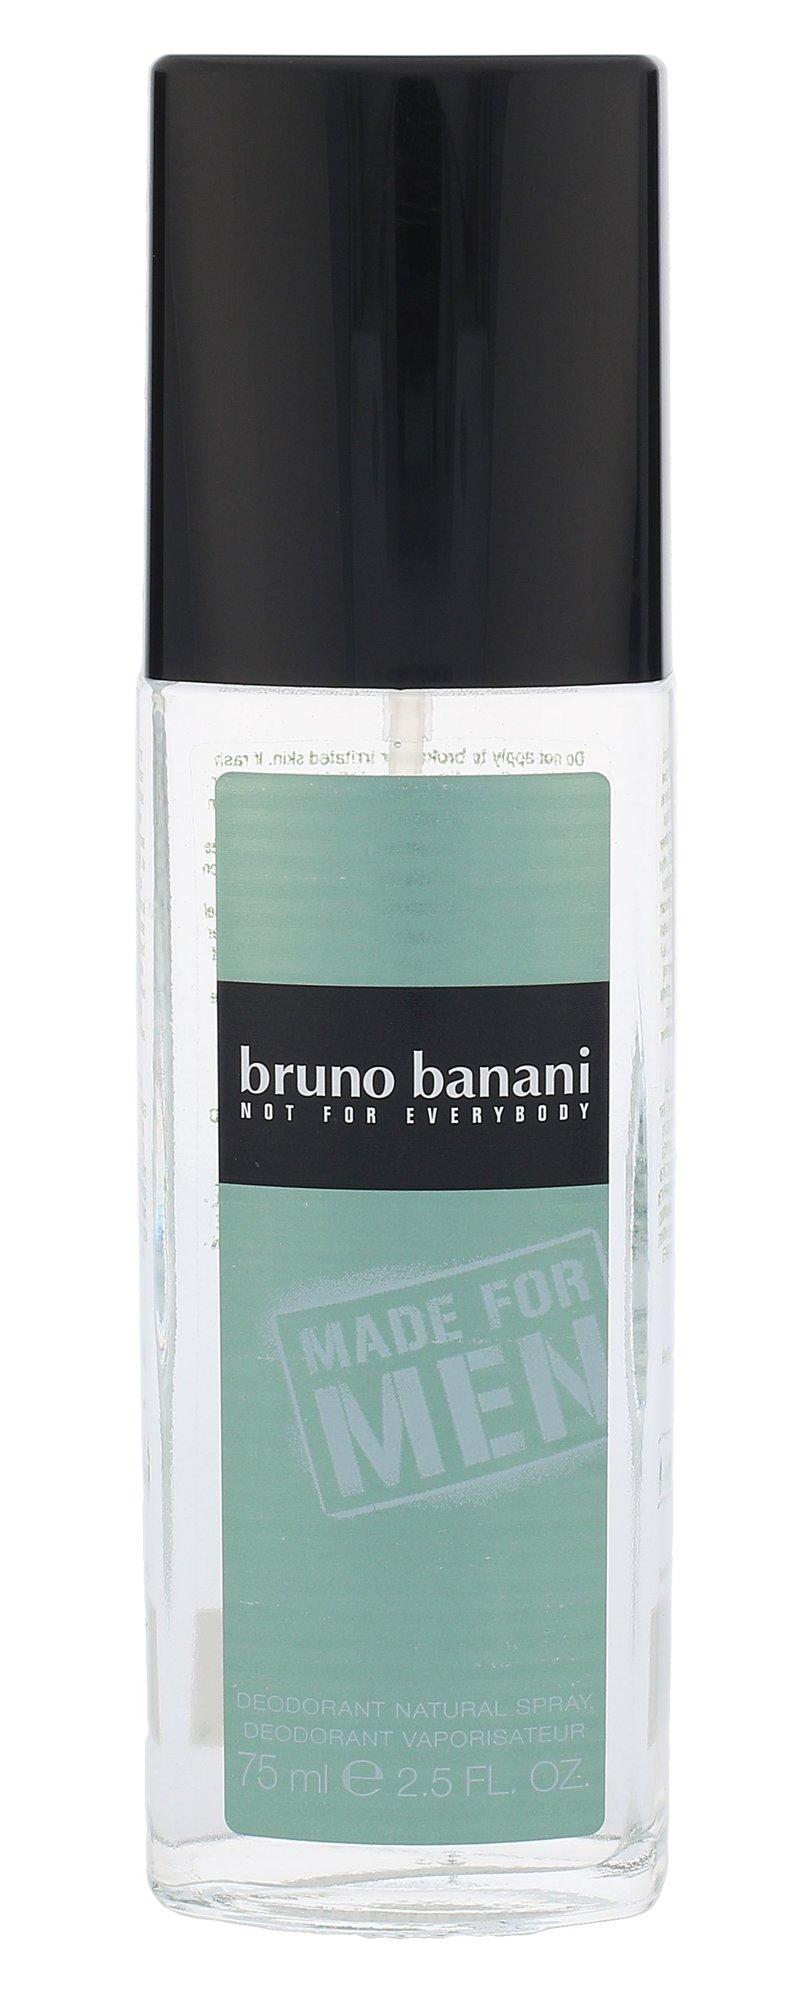 Bruno Banani Made for Men Deodorant 75ml